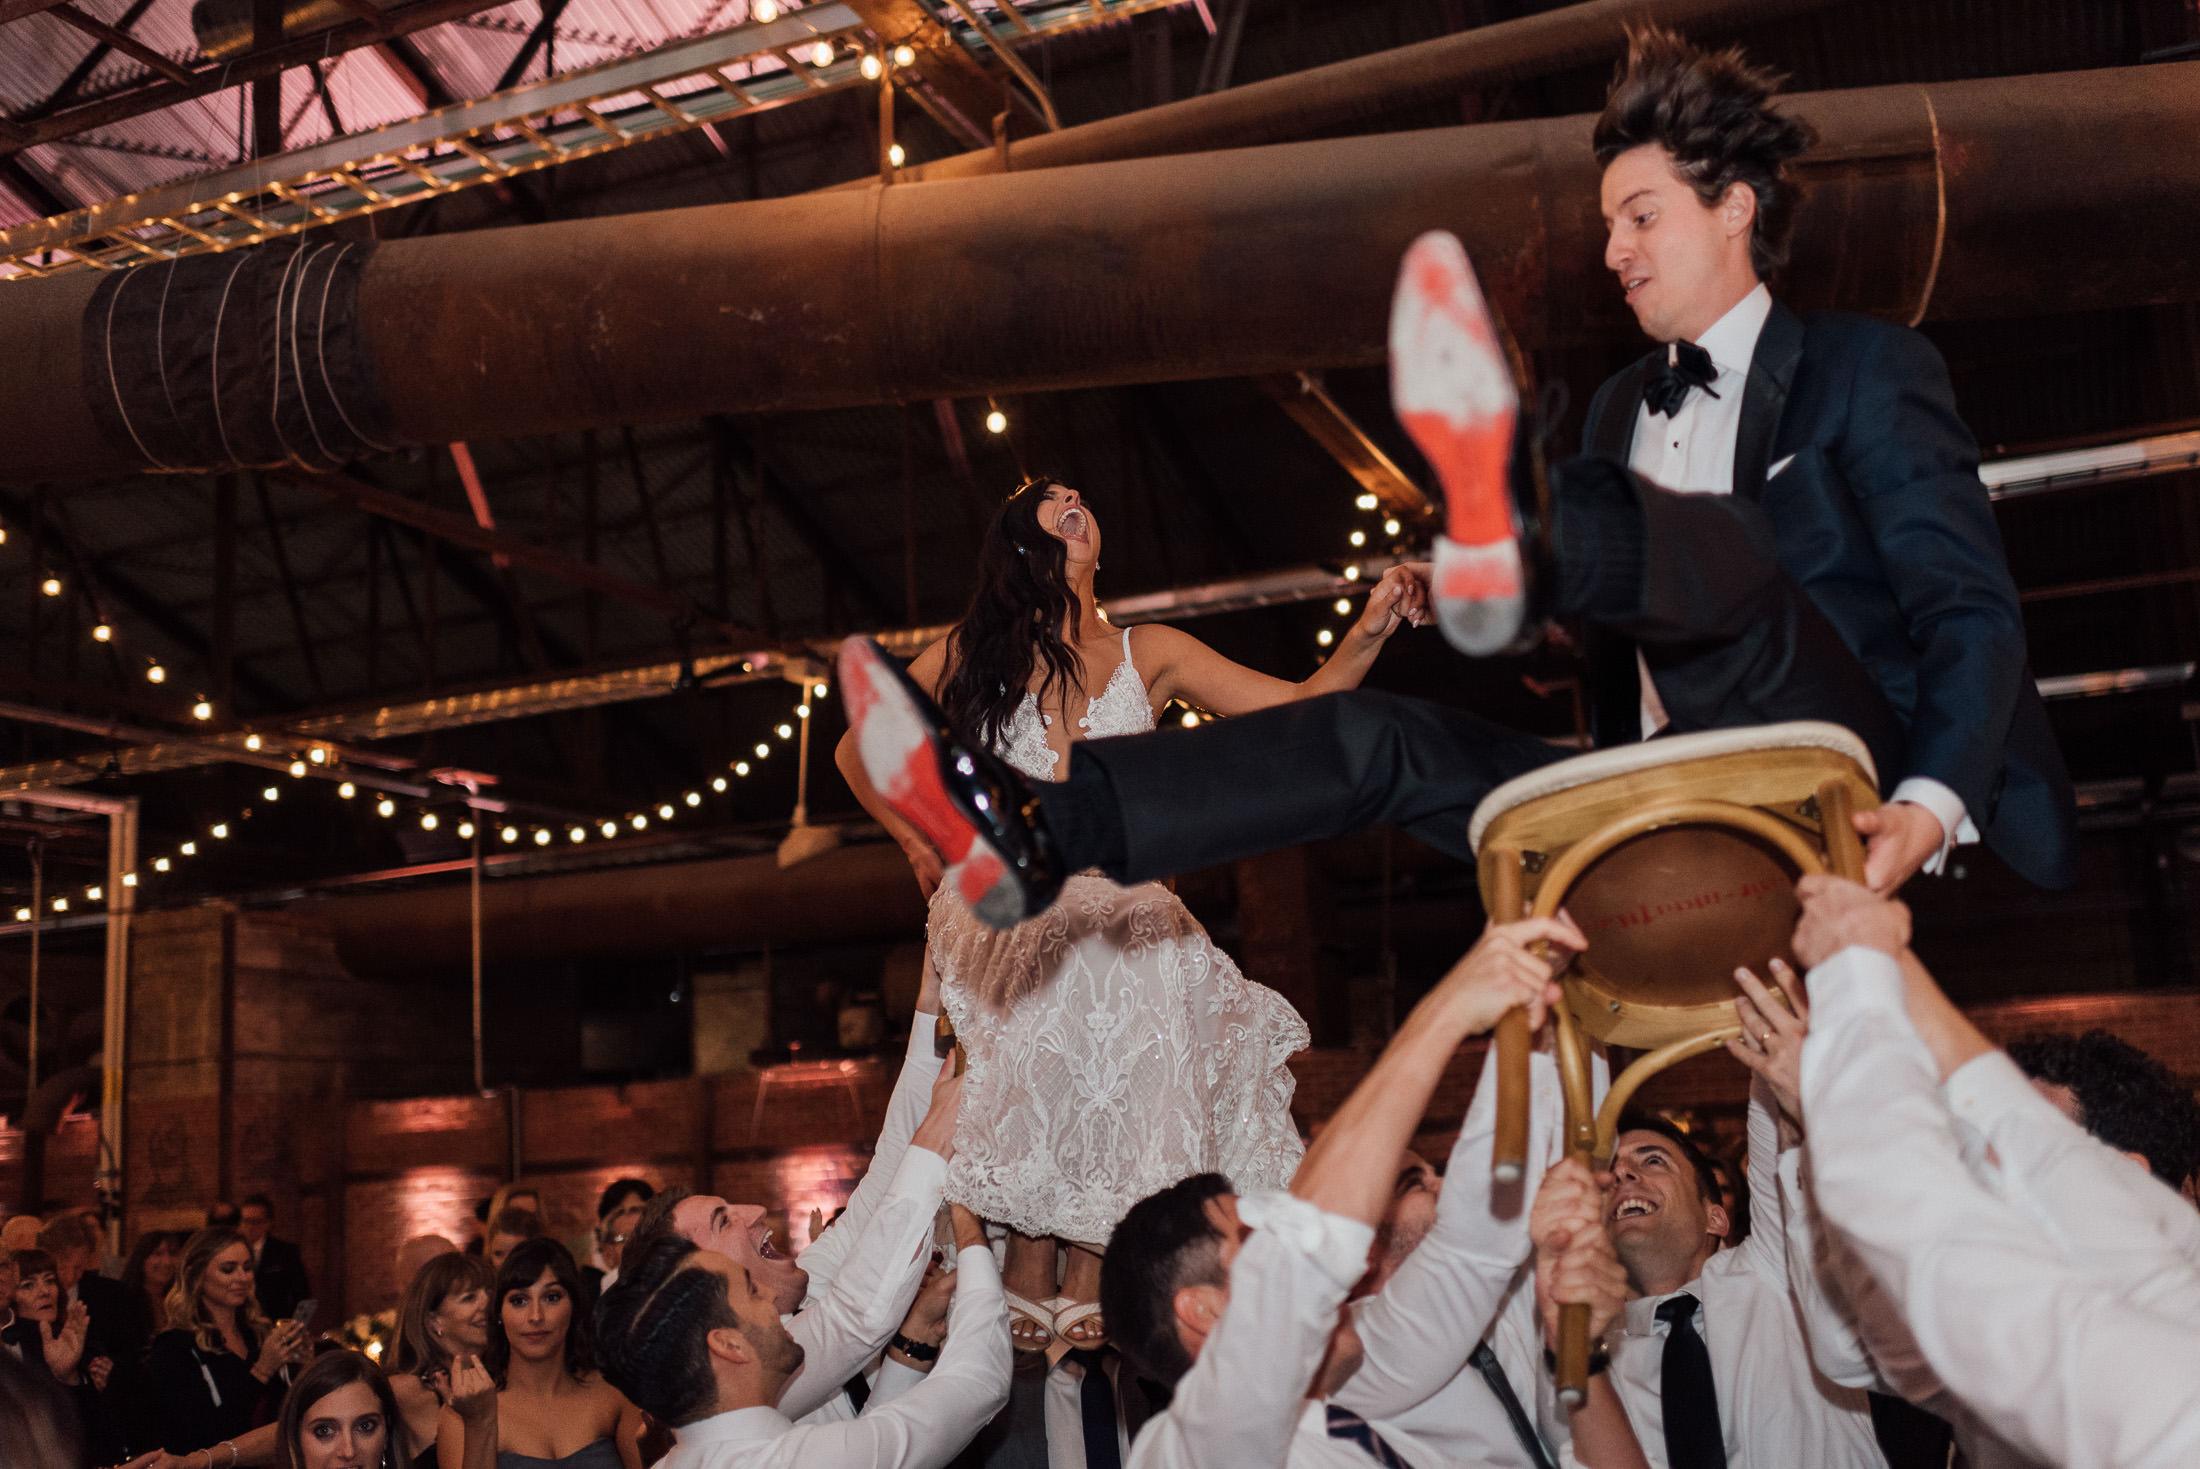 The best wedding photographer in Toronto